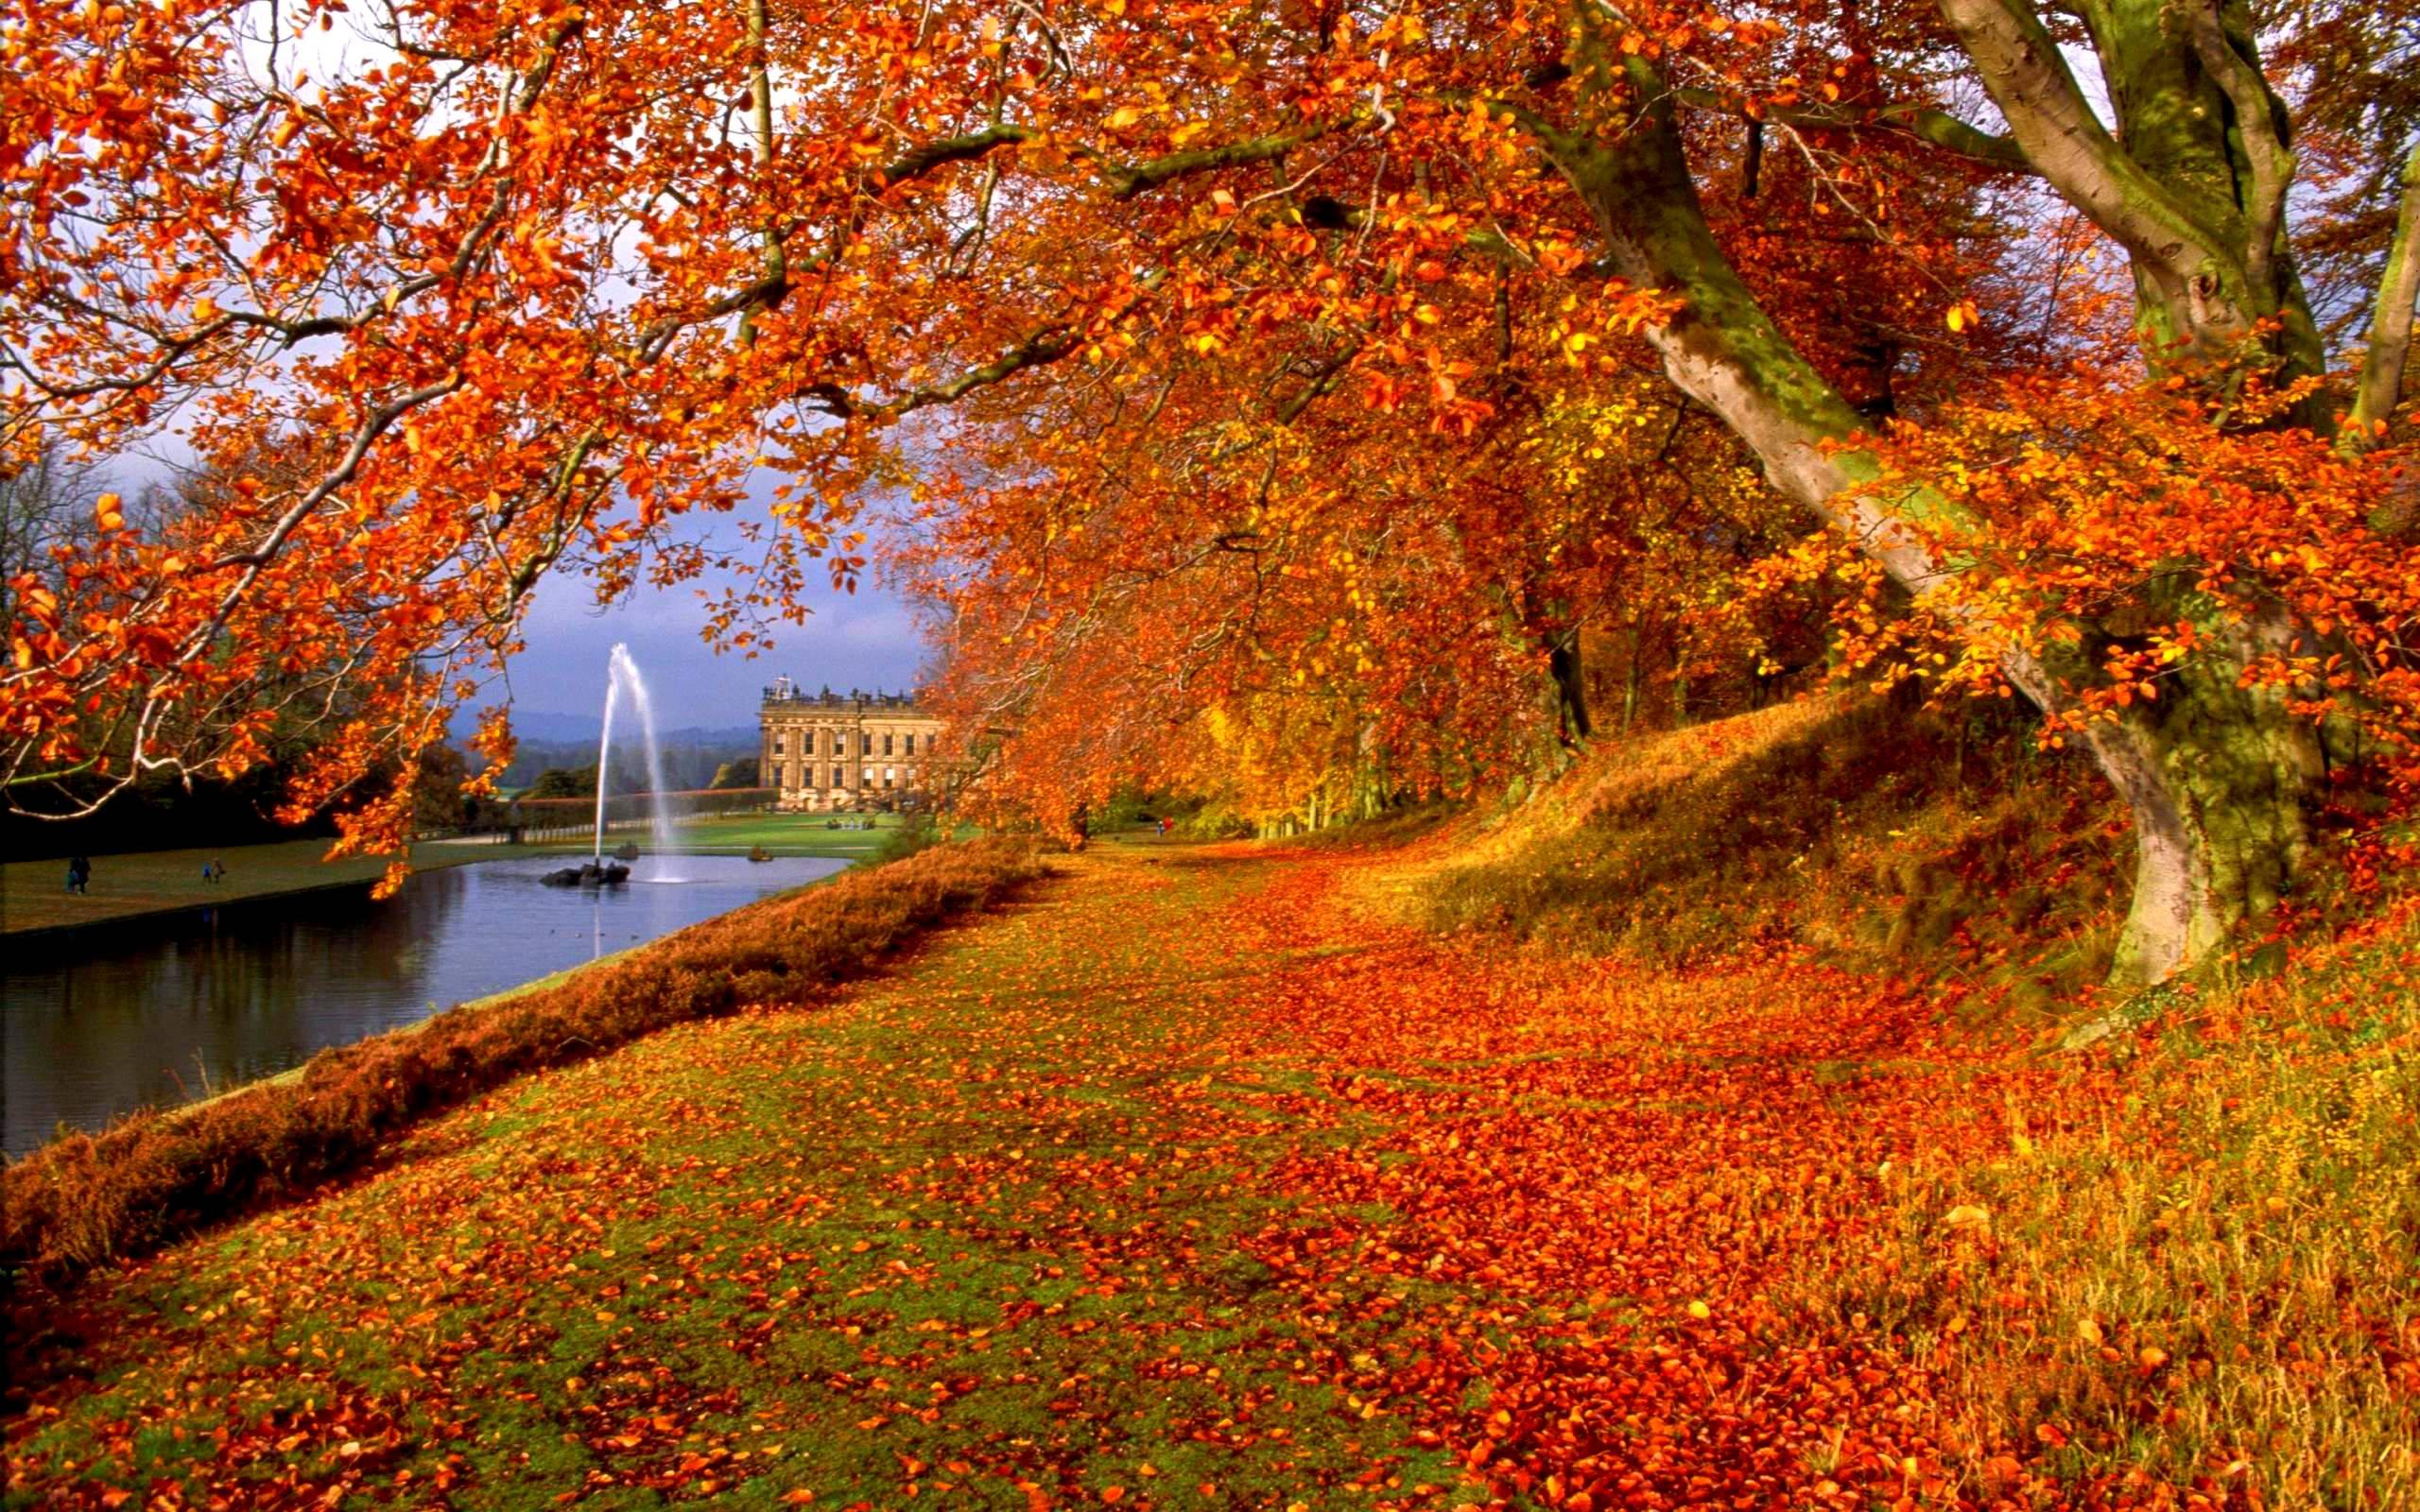 Autumn Backgrounds Image - Wallpaper Cave